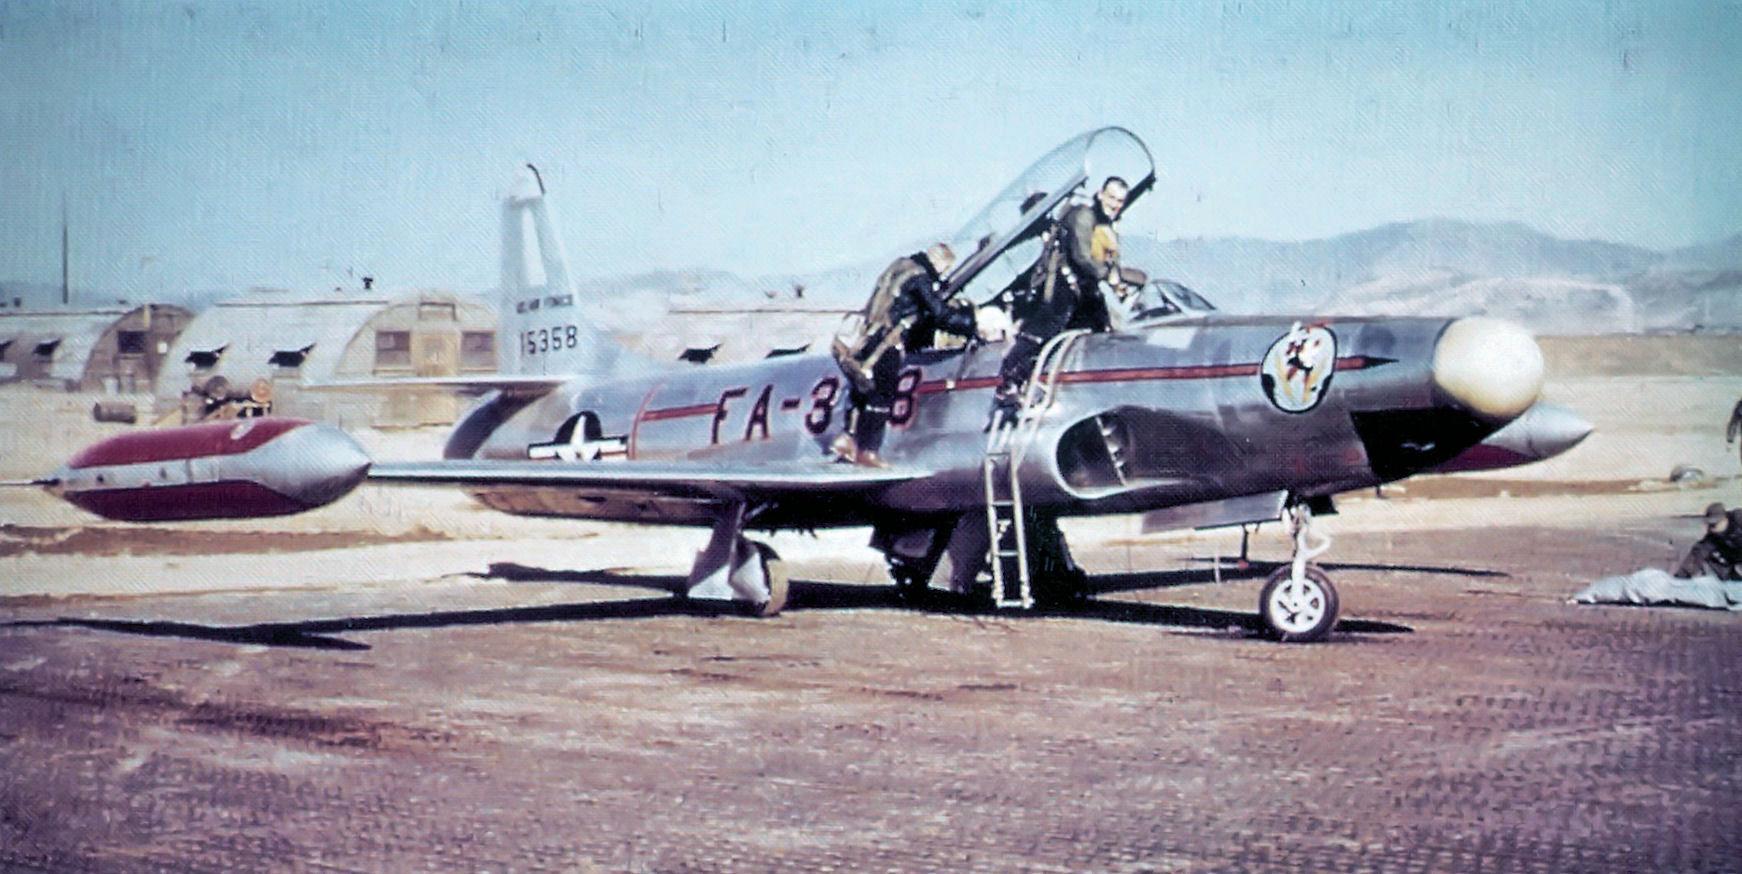 File:68th Fighter-Interceptor Squadron Lockheed F-94B-5-LO 51